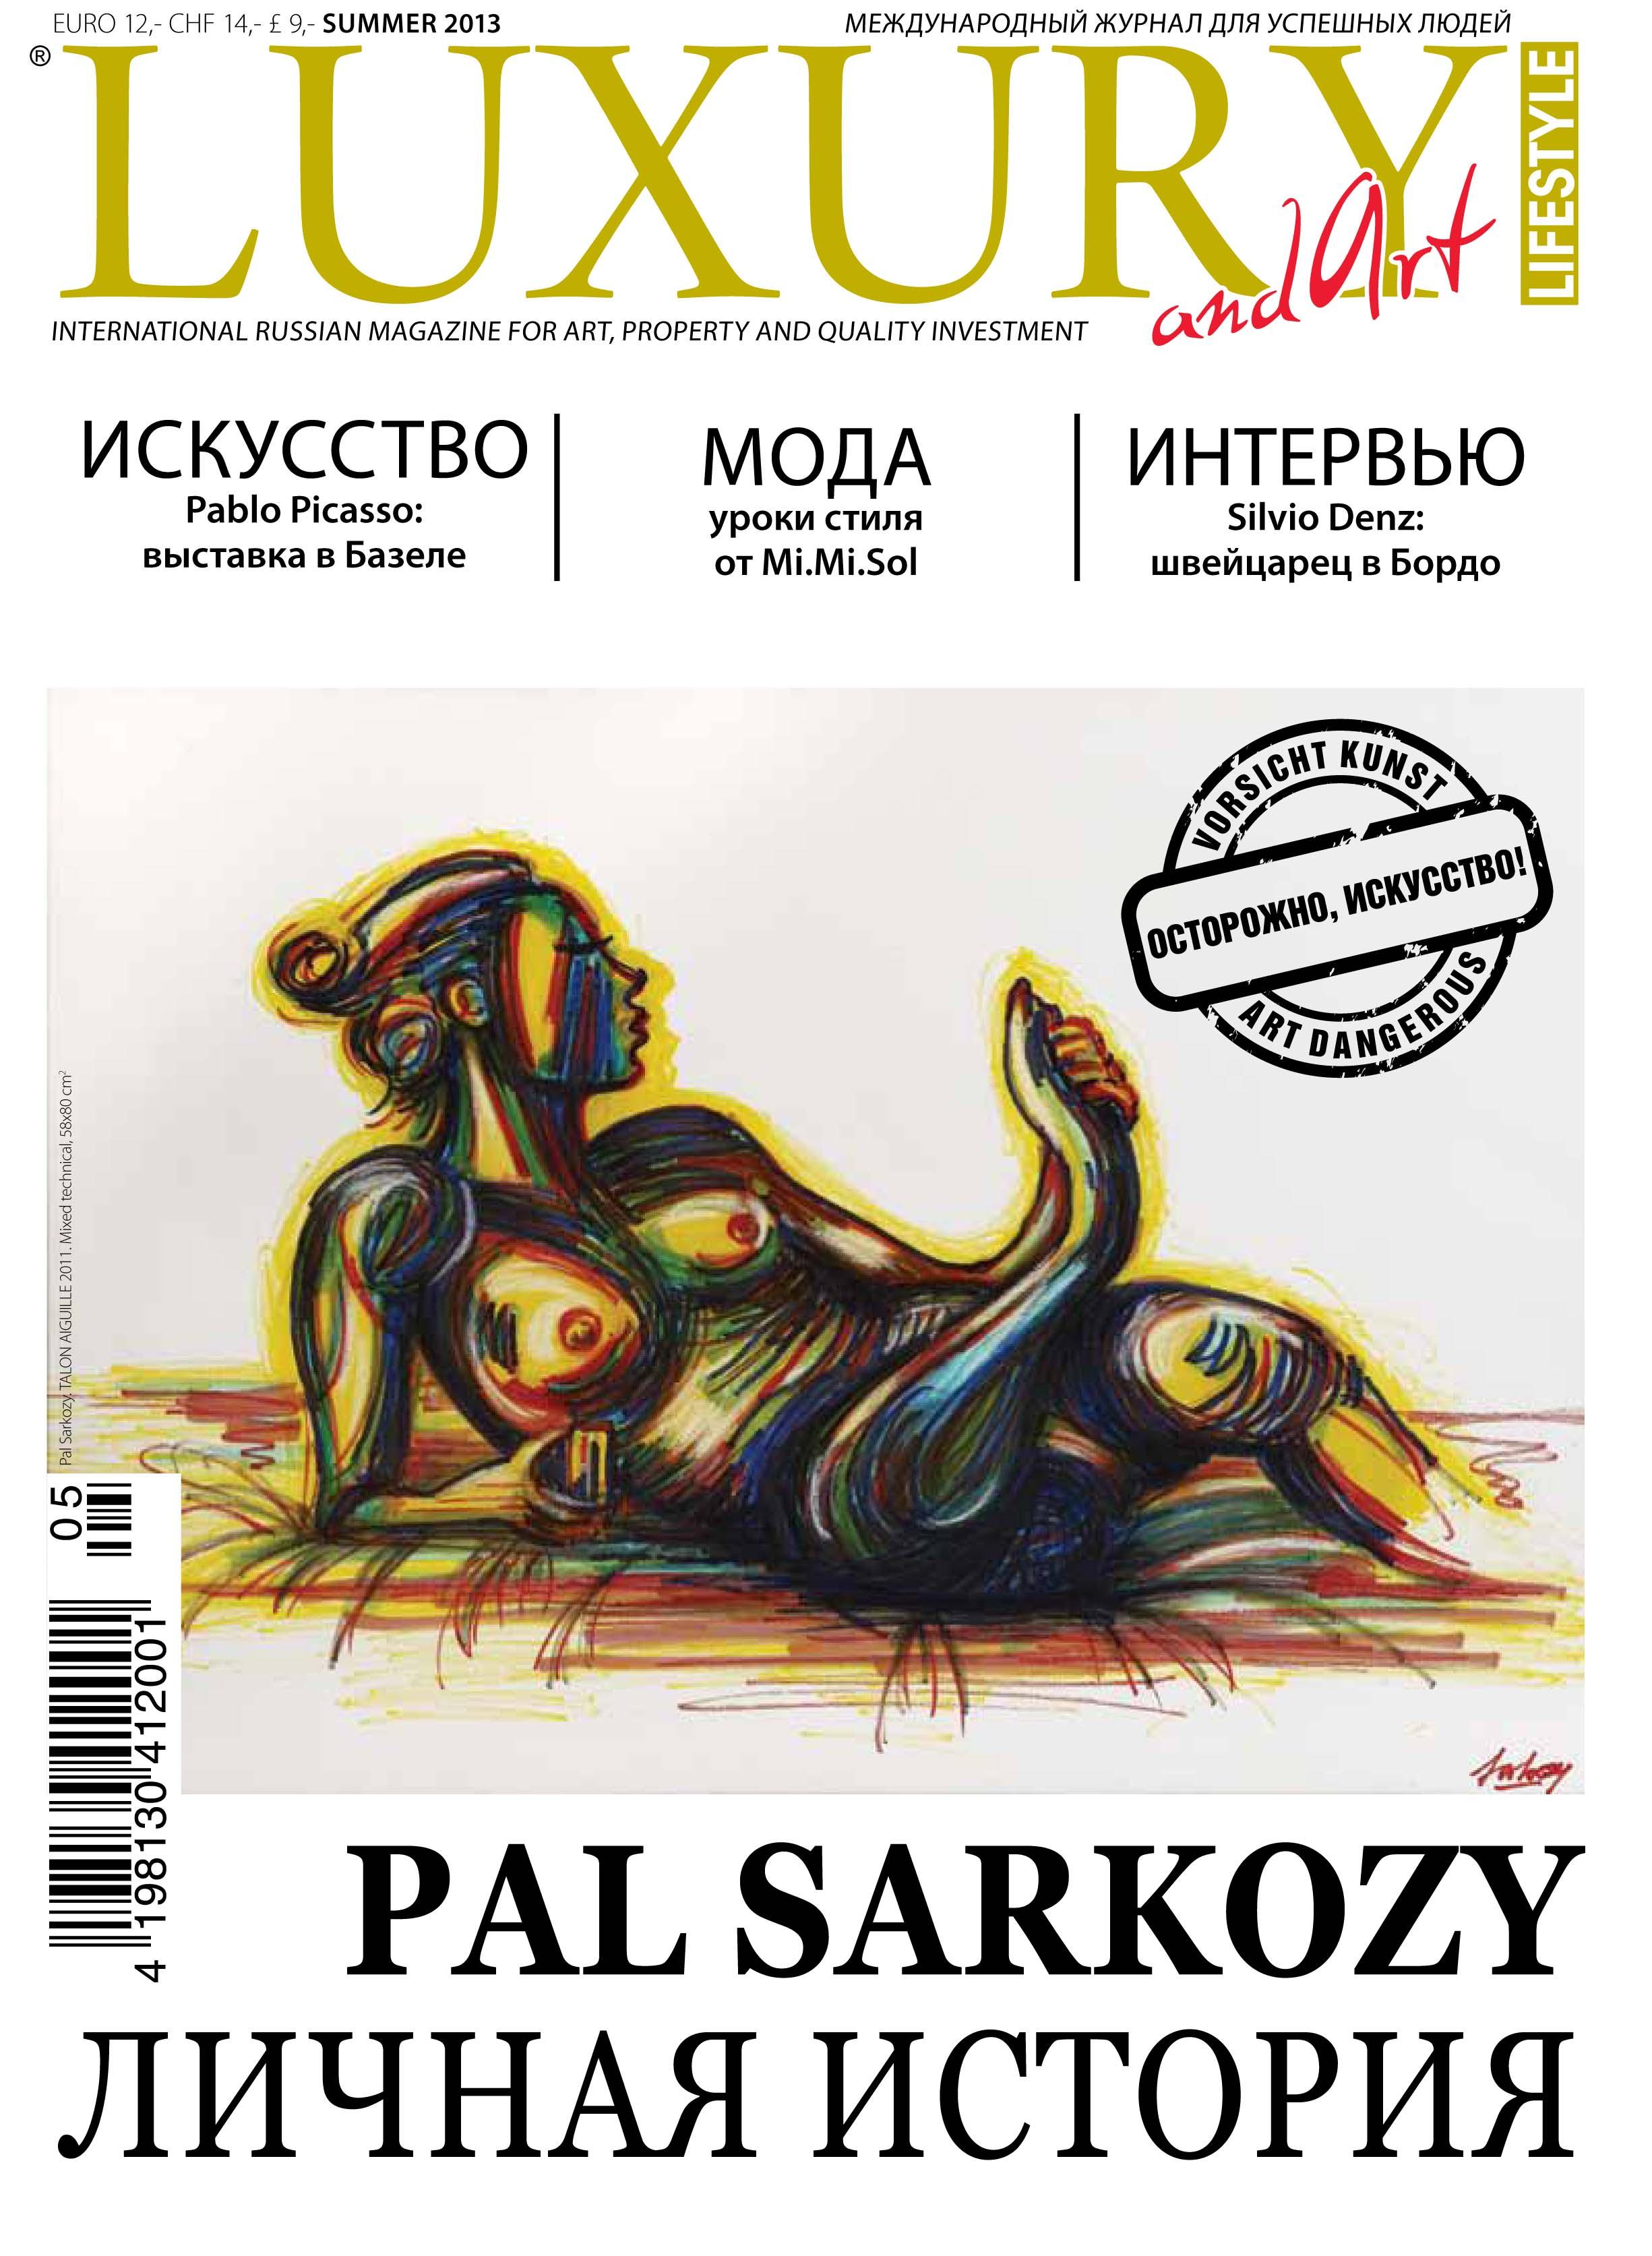 2017 fashion prints - Russian Luxury Lifestyle Magazine Summer 2013 Mark Shaw